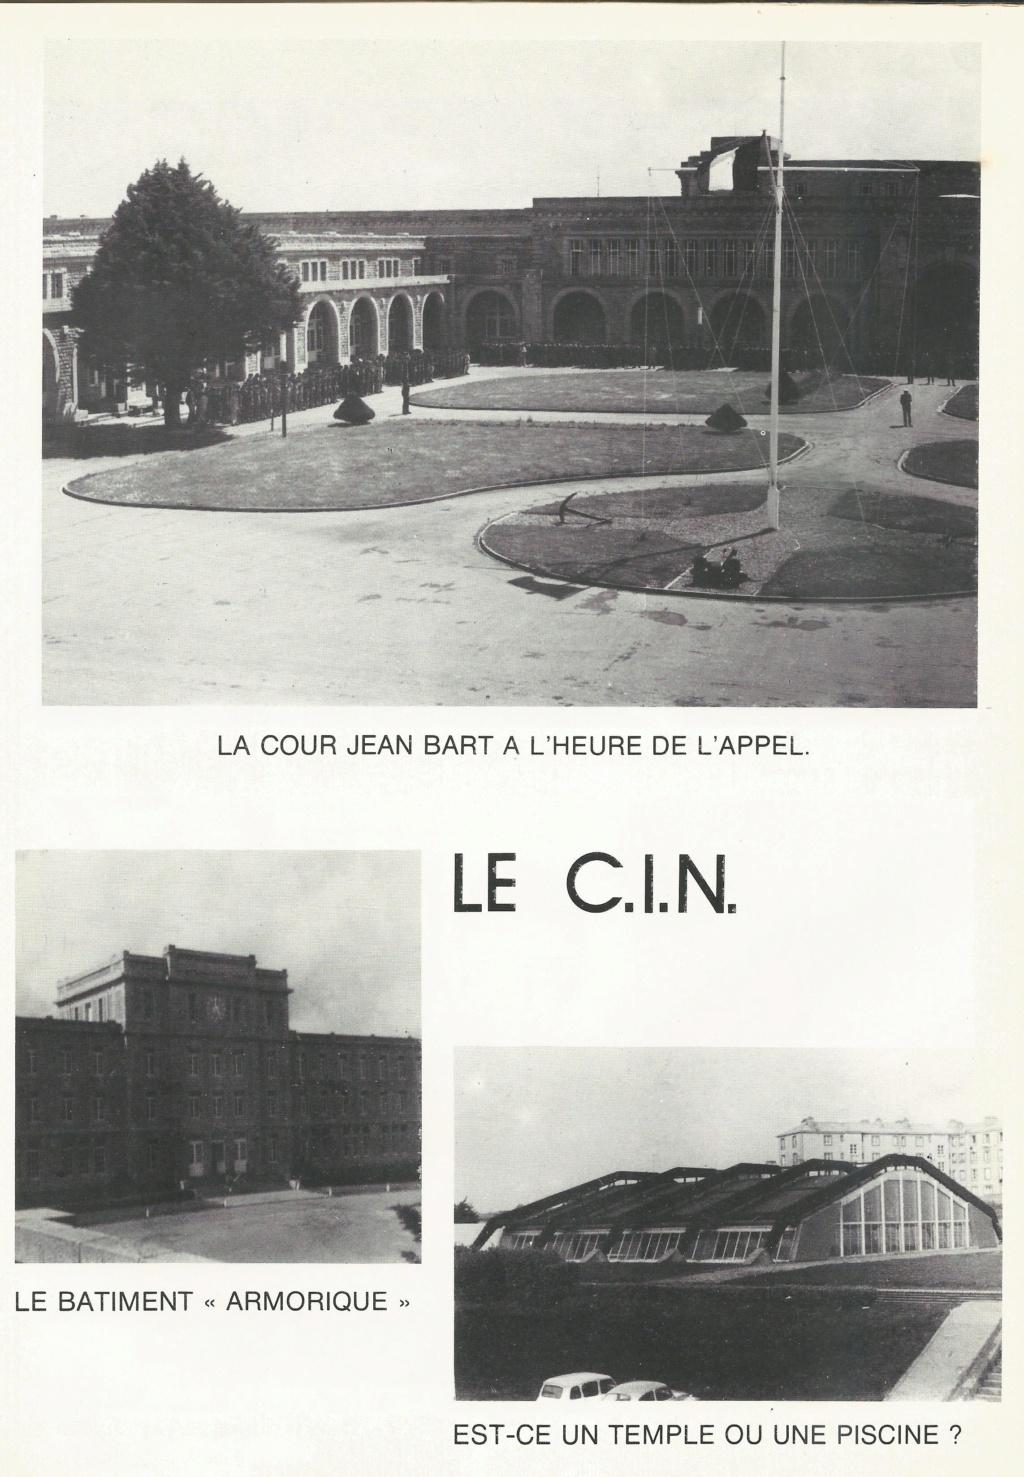 [ École des Mousses ] École des mousses 76/77 Mousse20